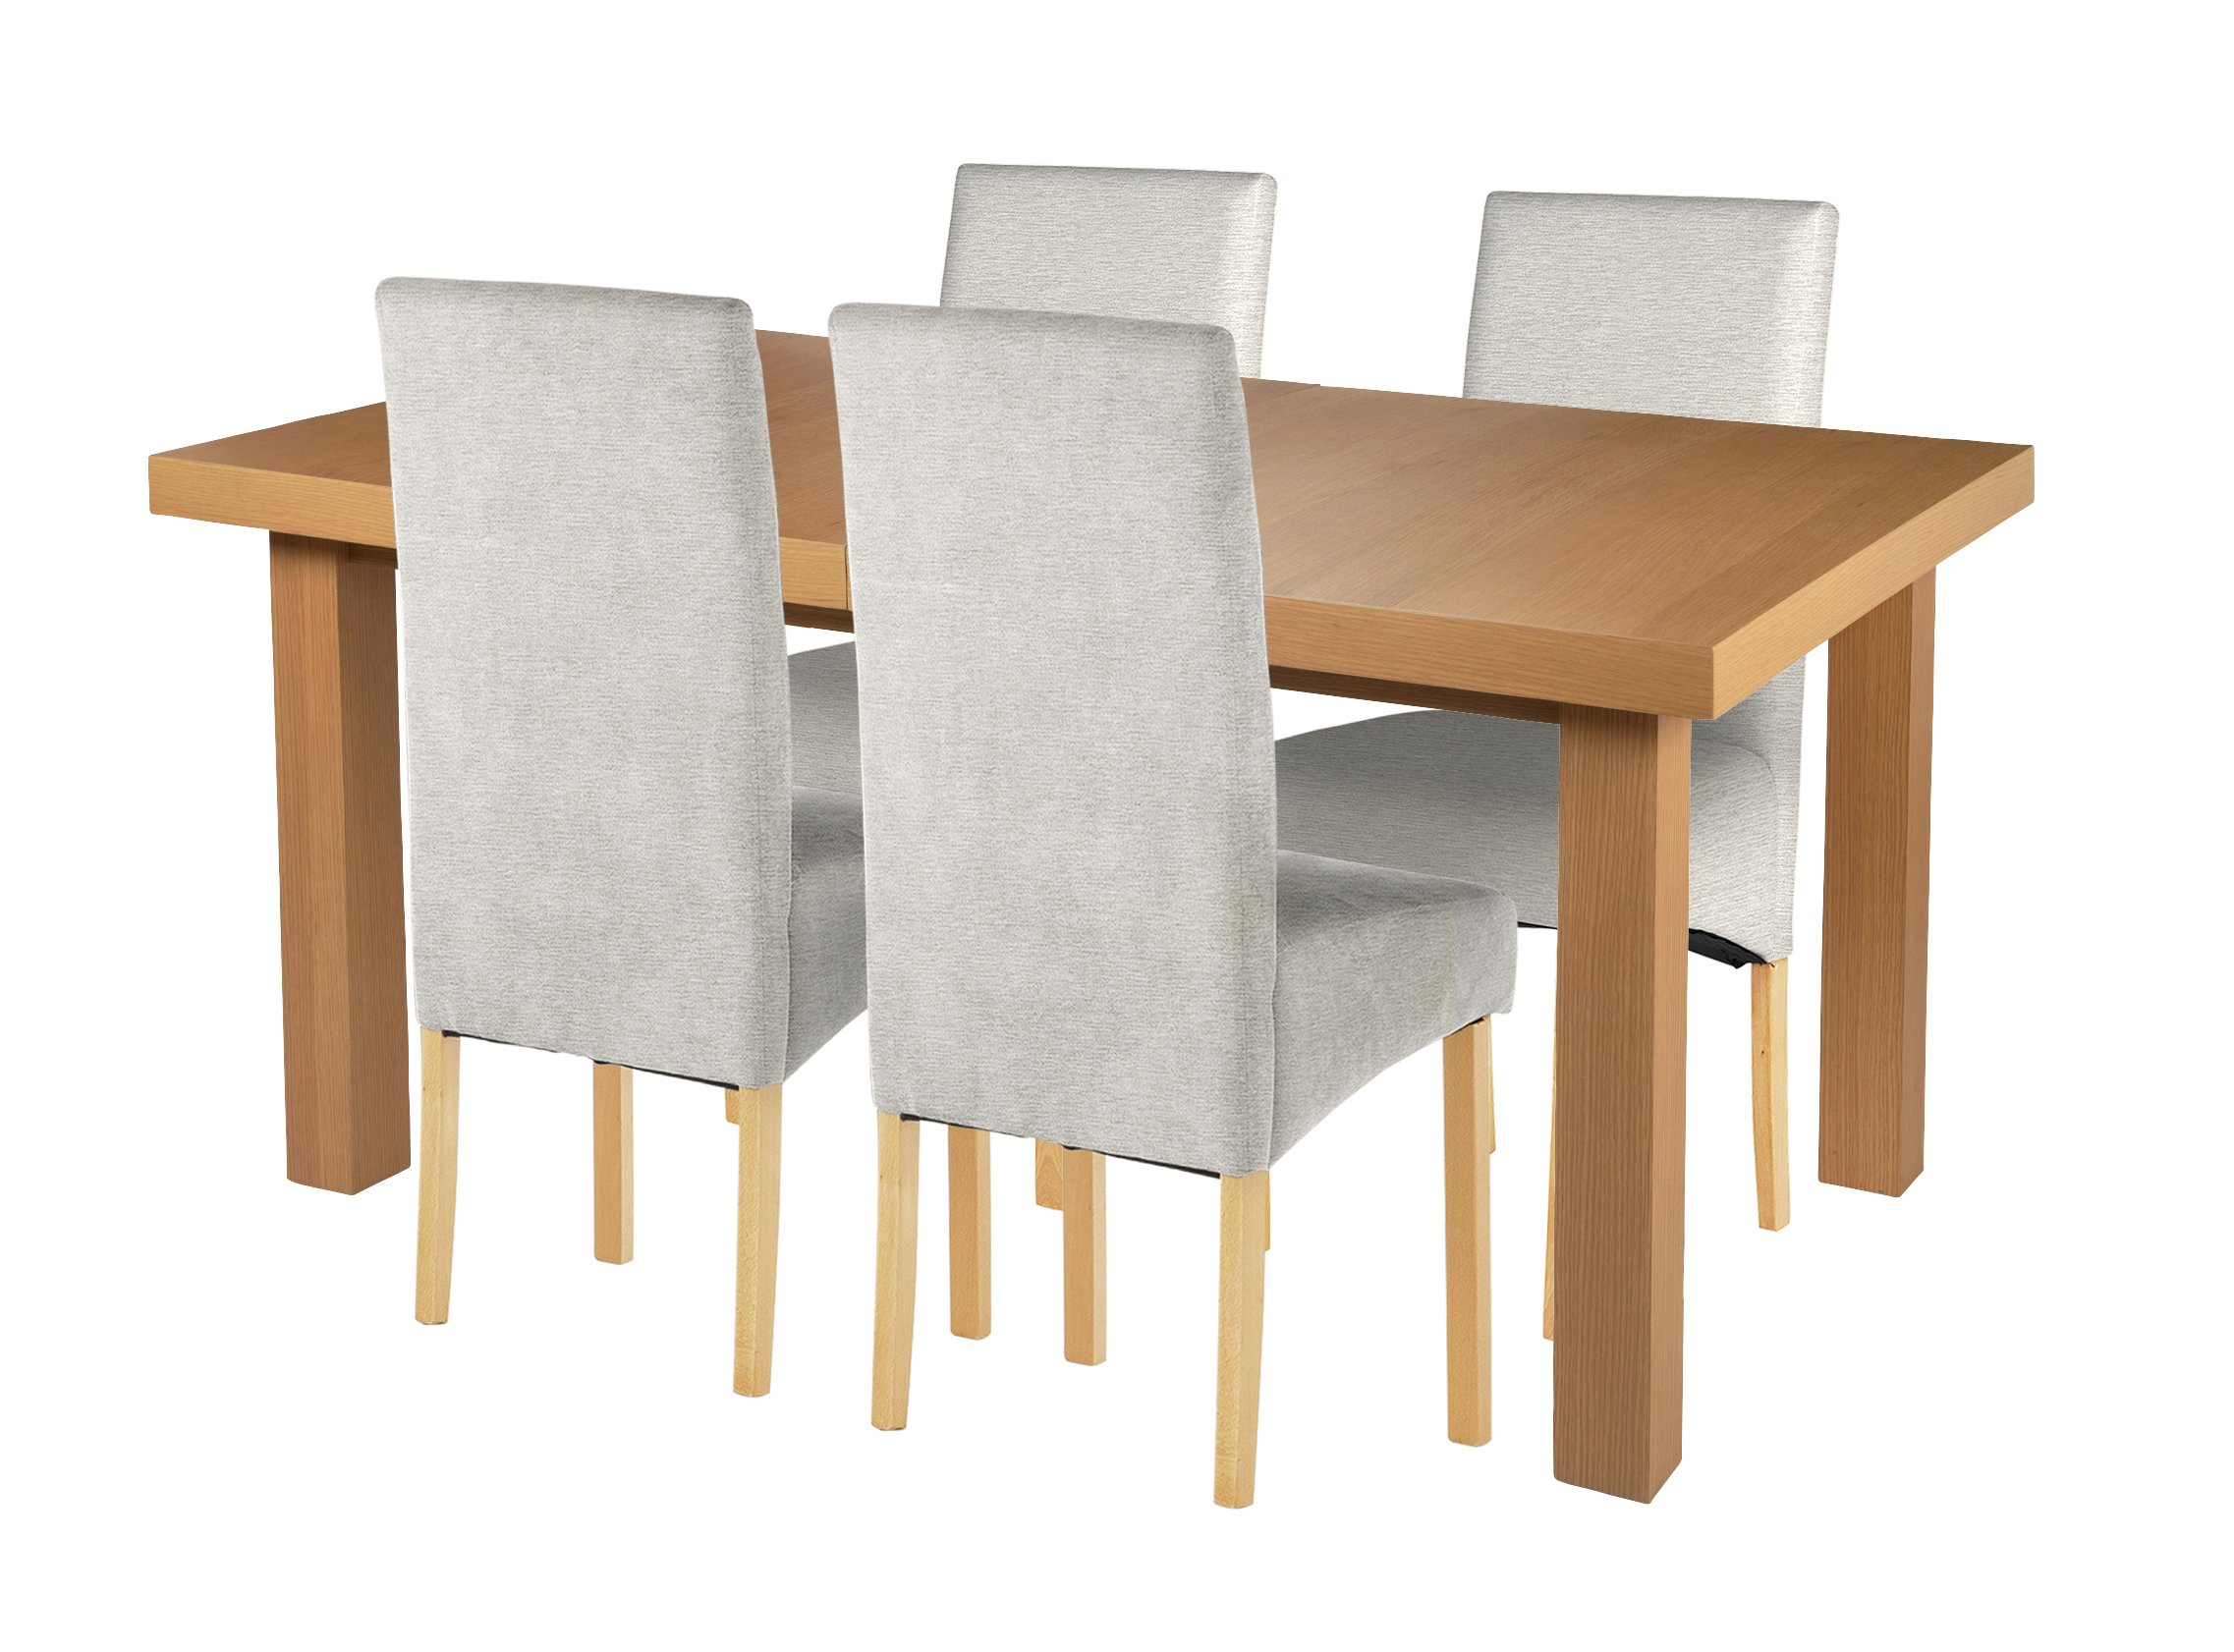 Image of Cosgrove Ext Oak Veneer Dining Table & 4 Chairs - Grey